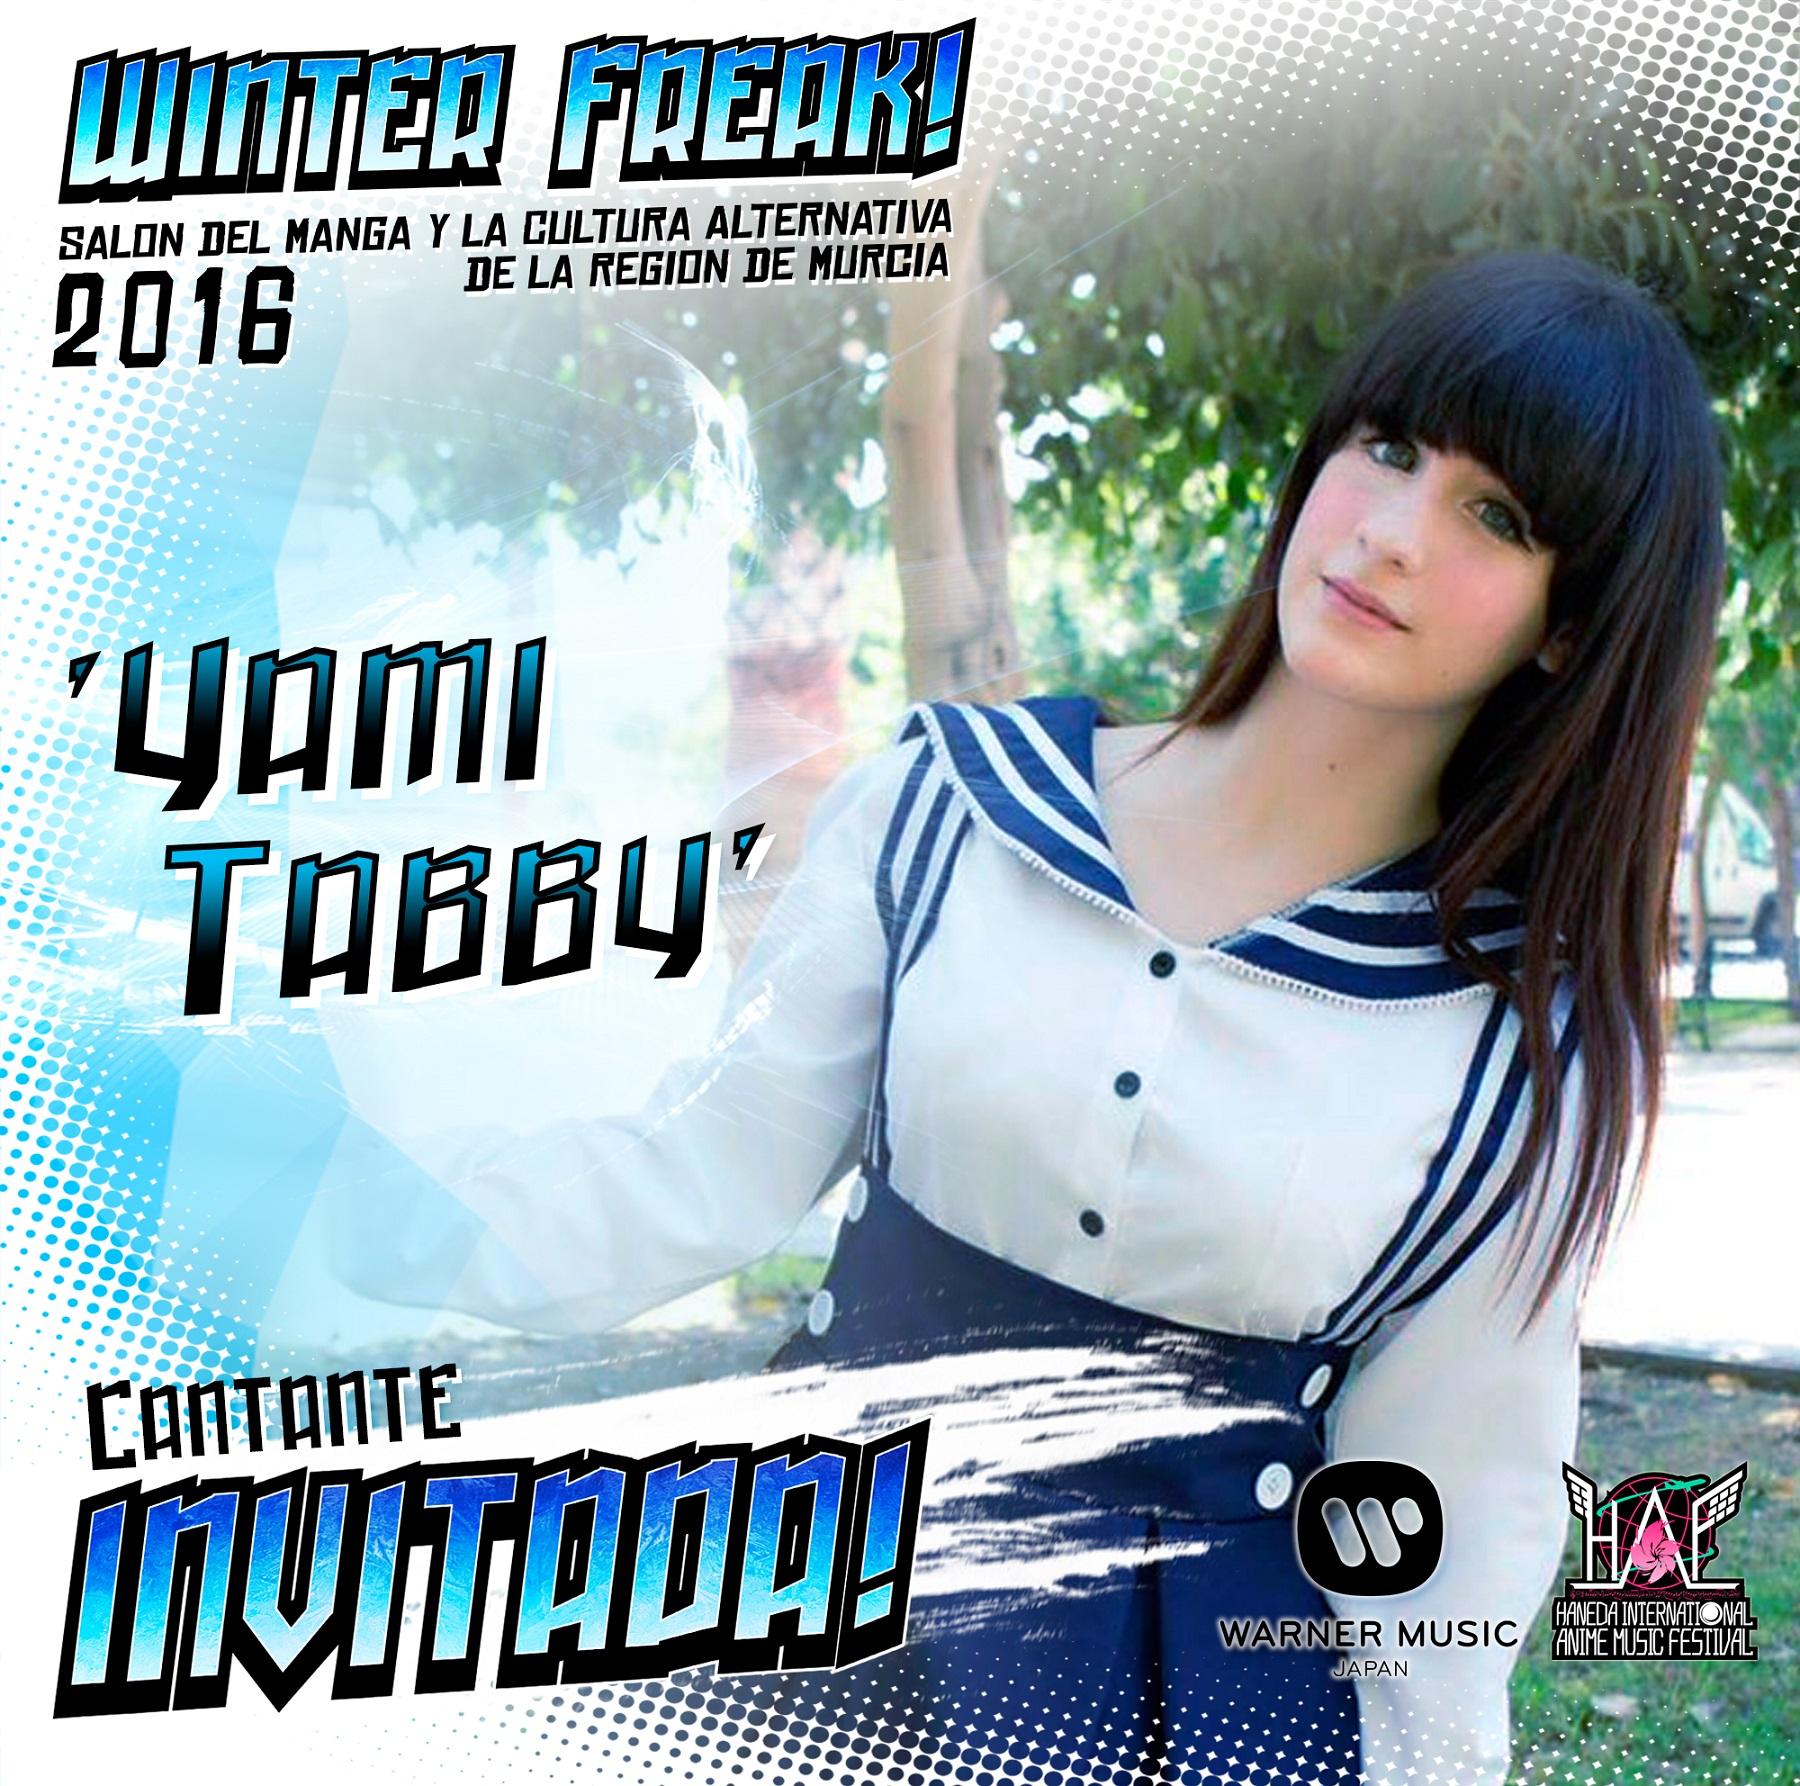 Yami Tabby